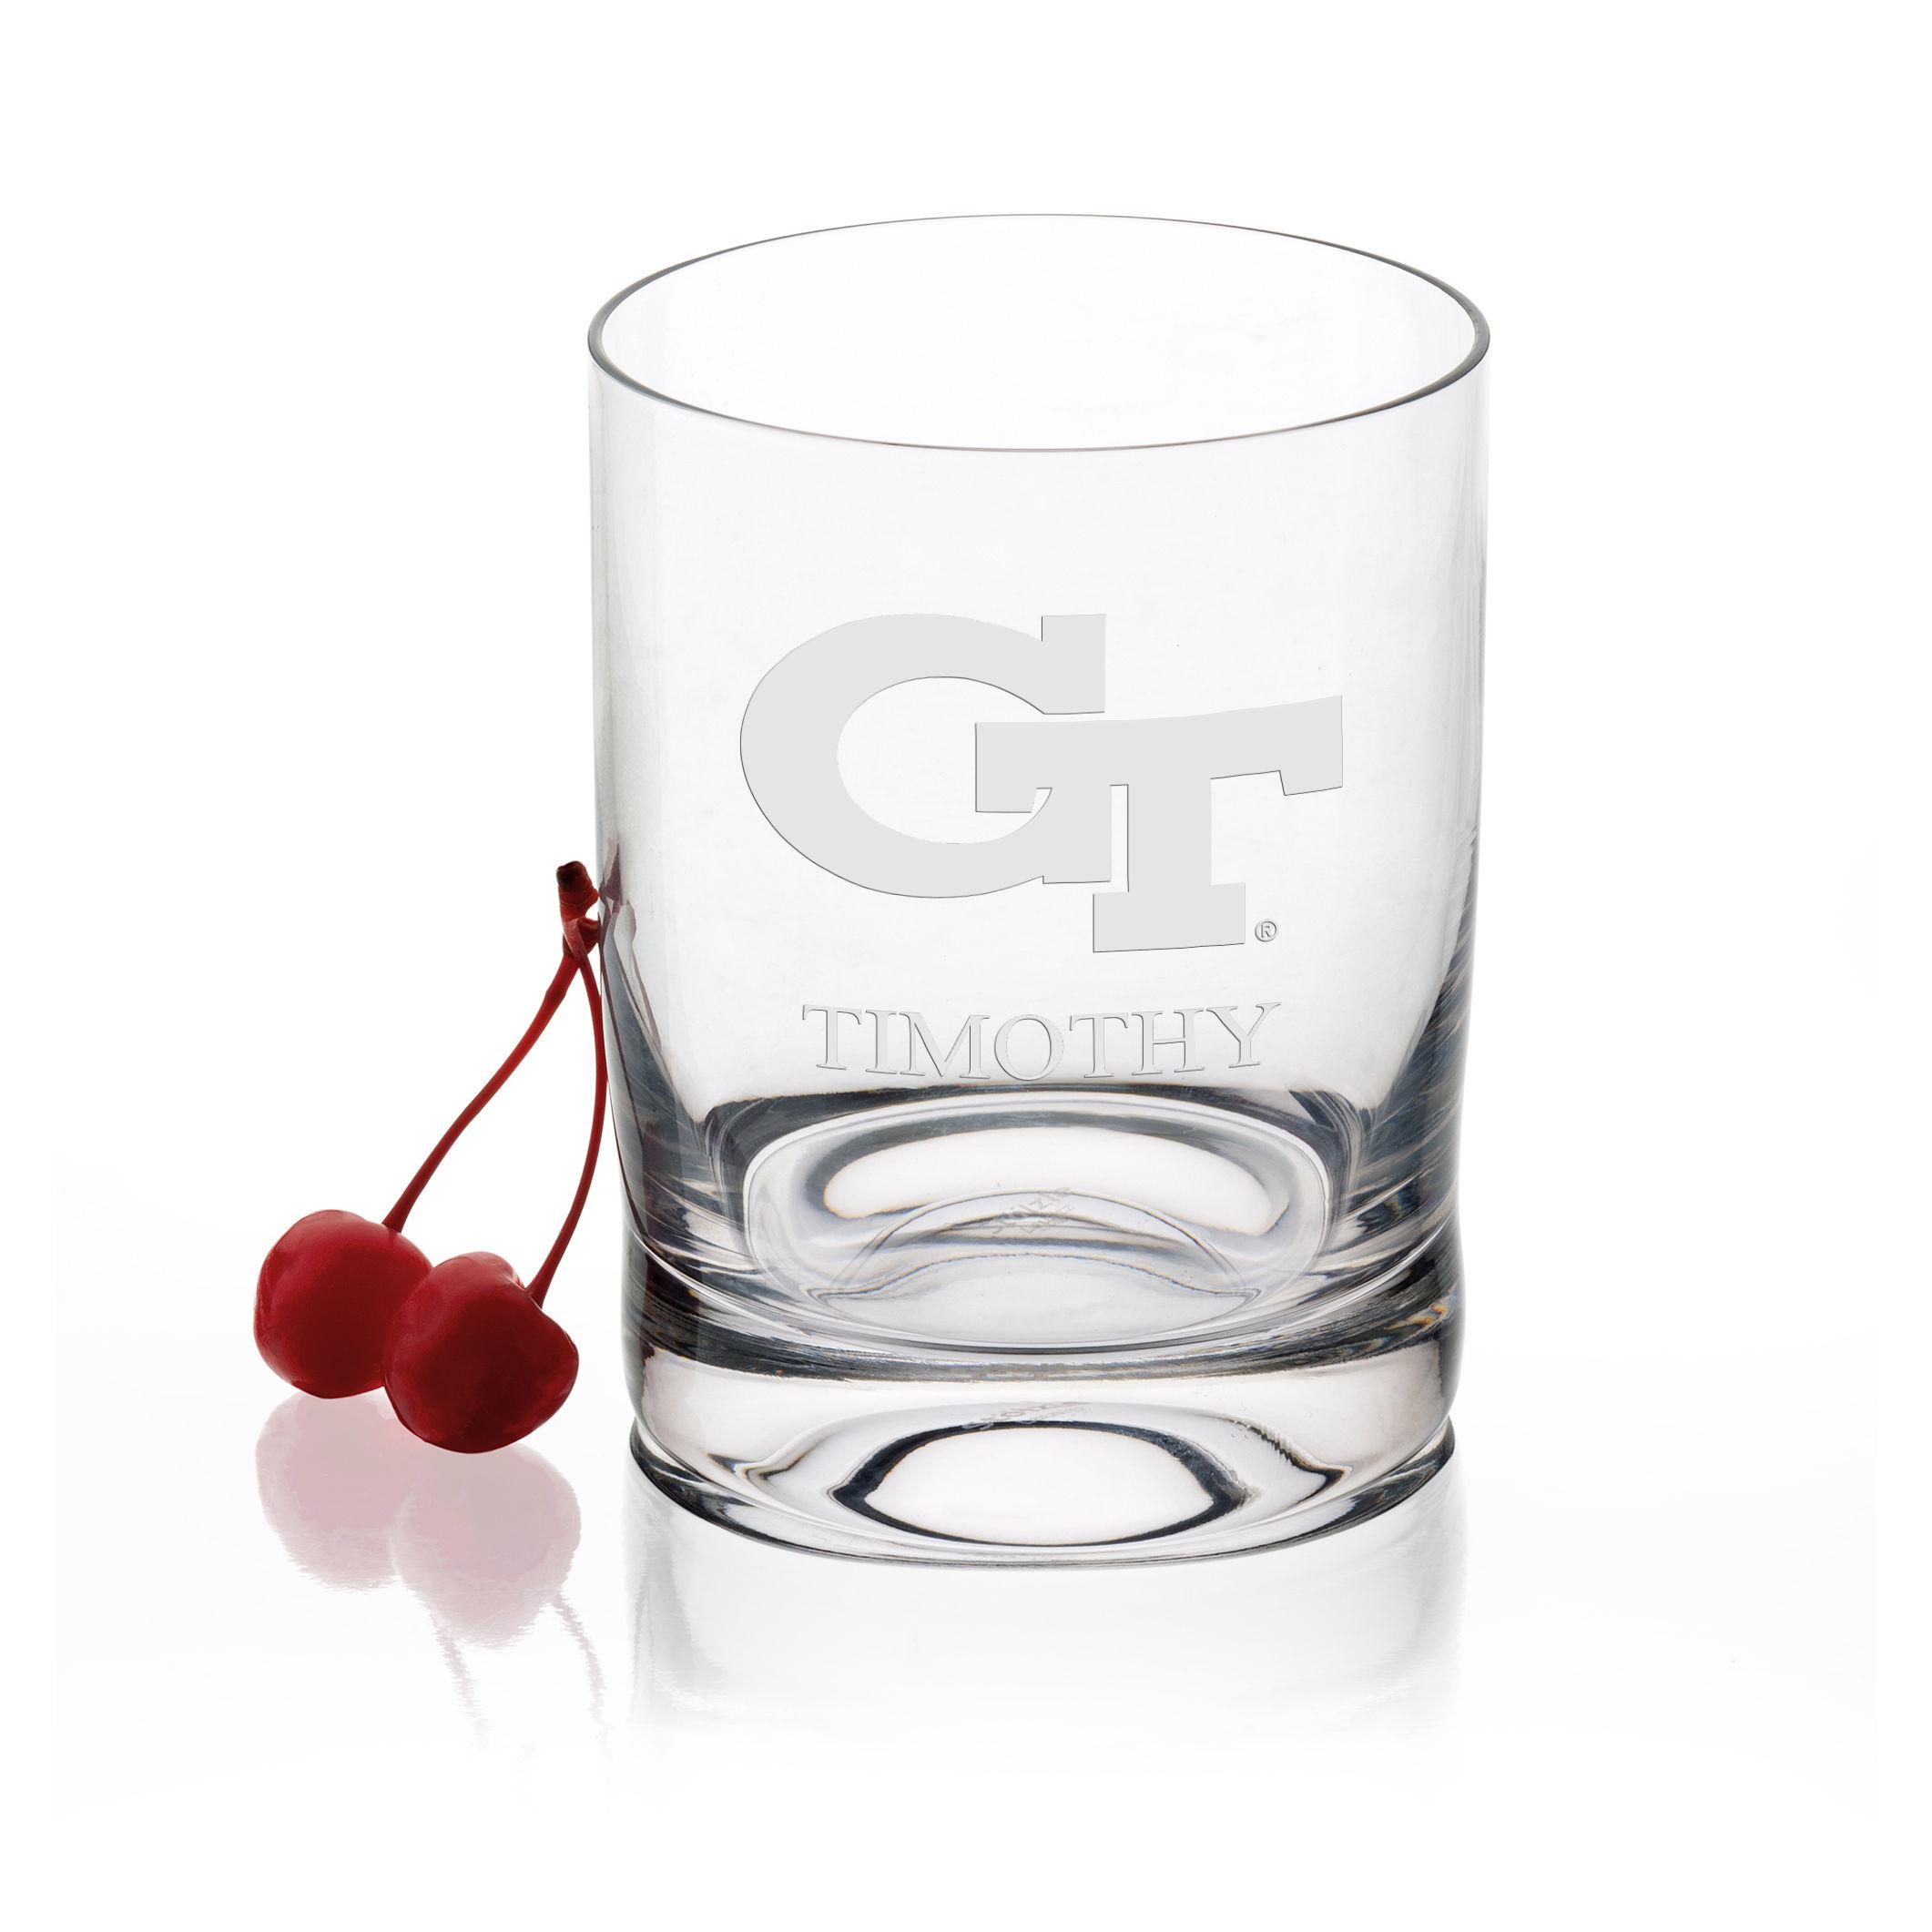 Georgia Tech Tumbler Glasses - Set of 2